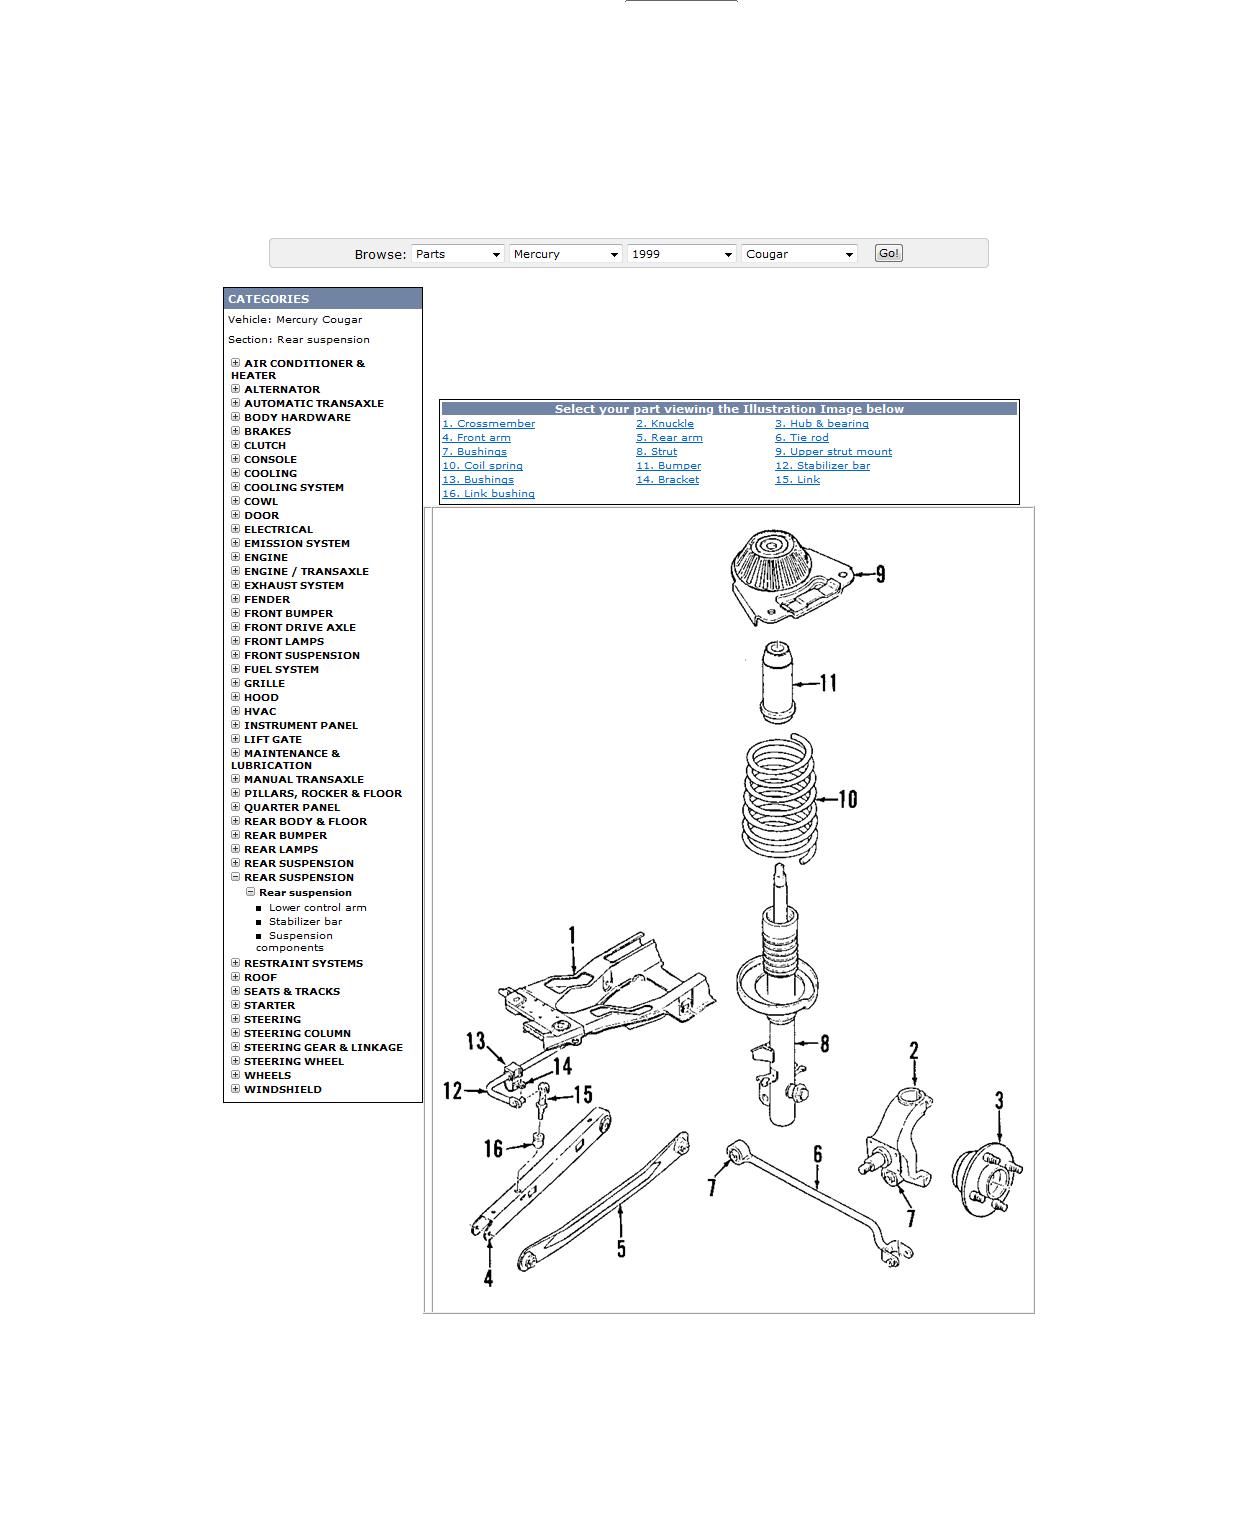 mercury cougar transmission diagram  mercury  free engine